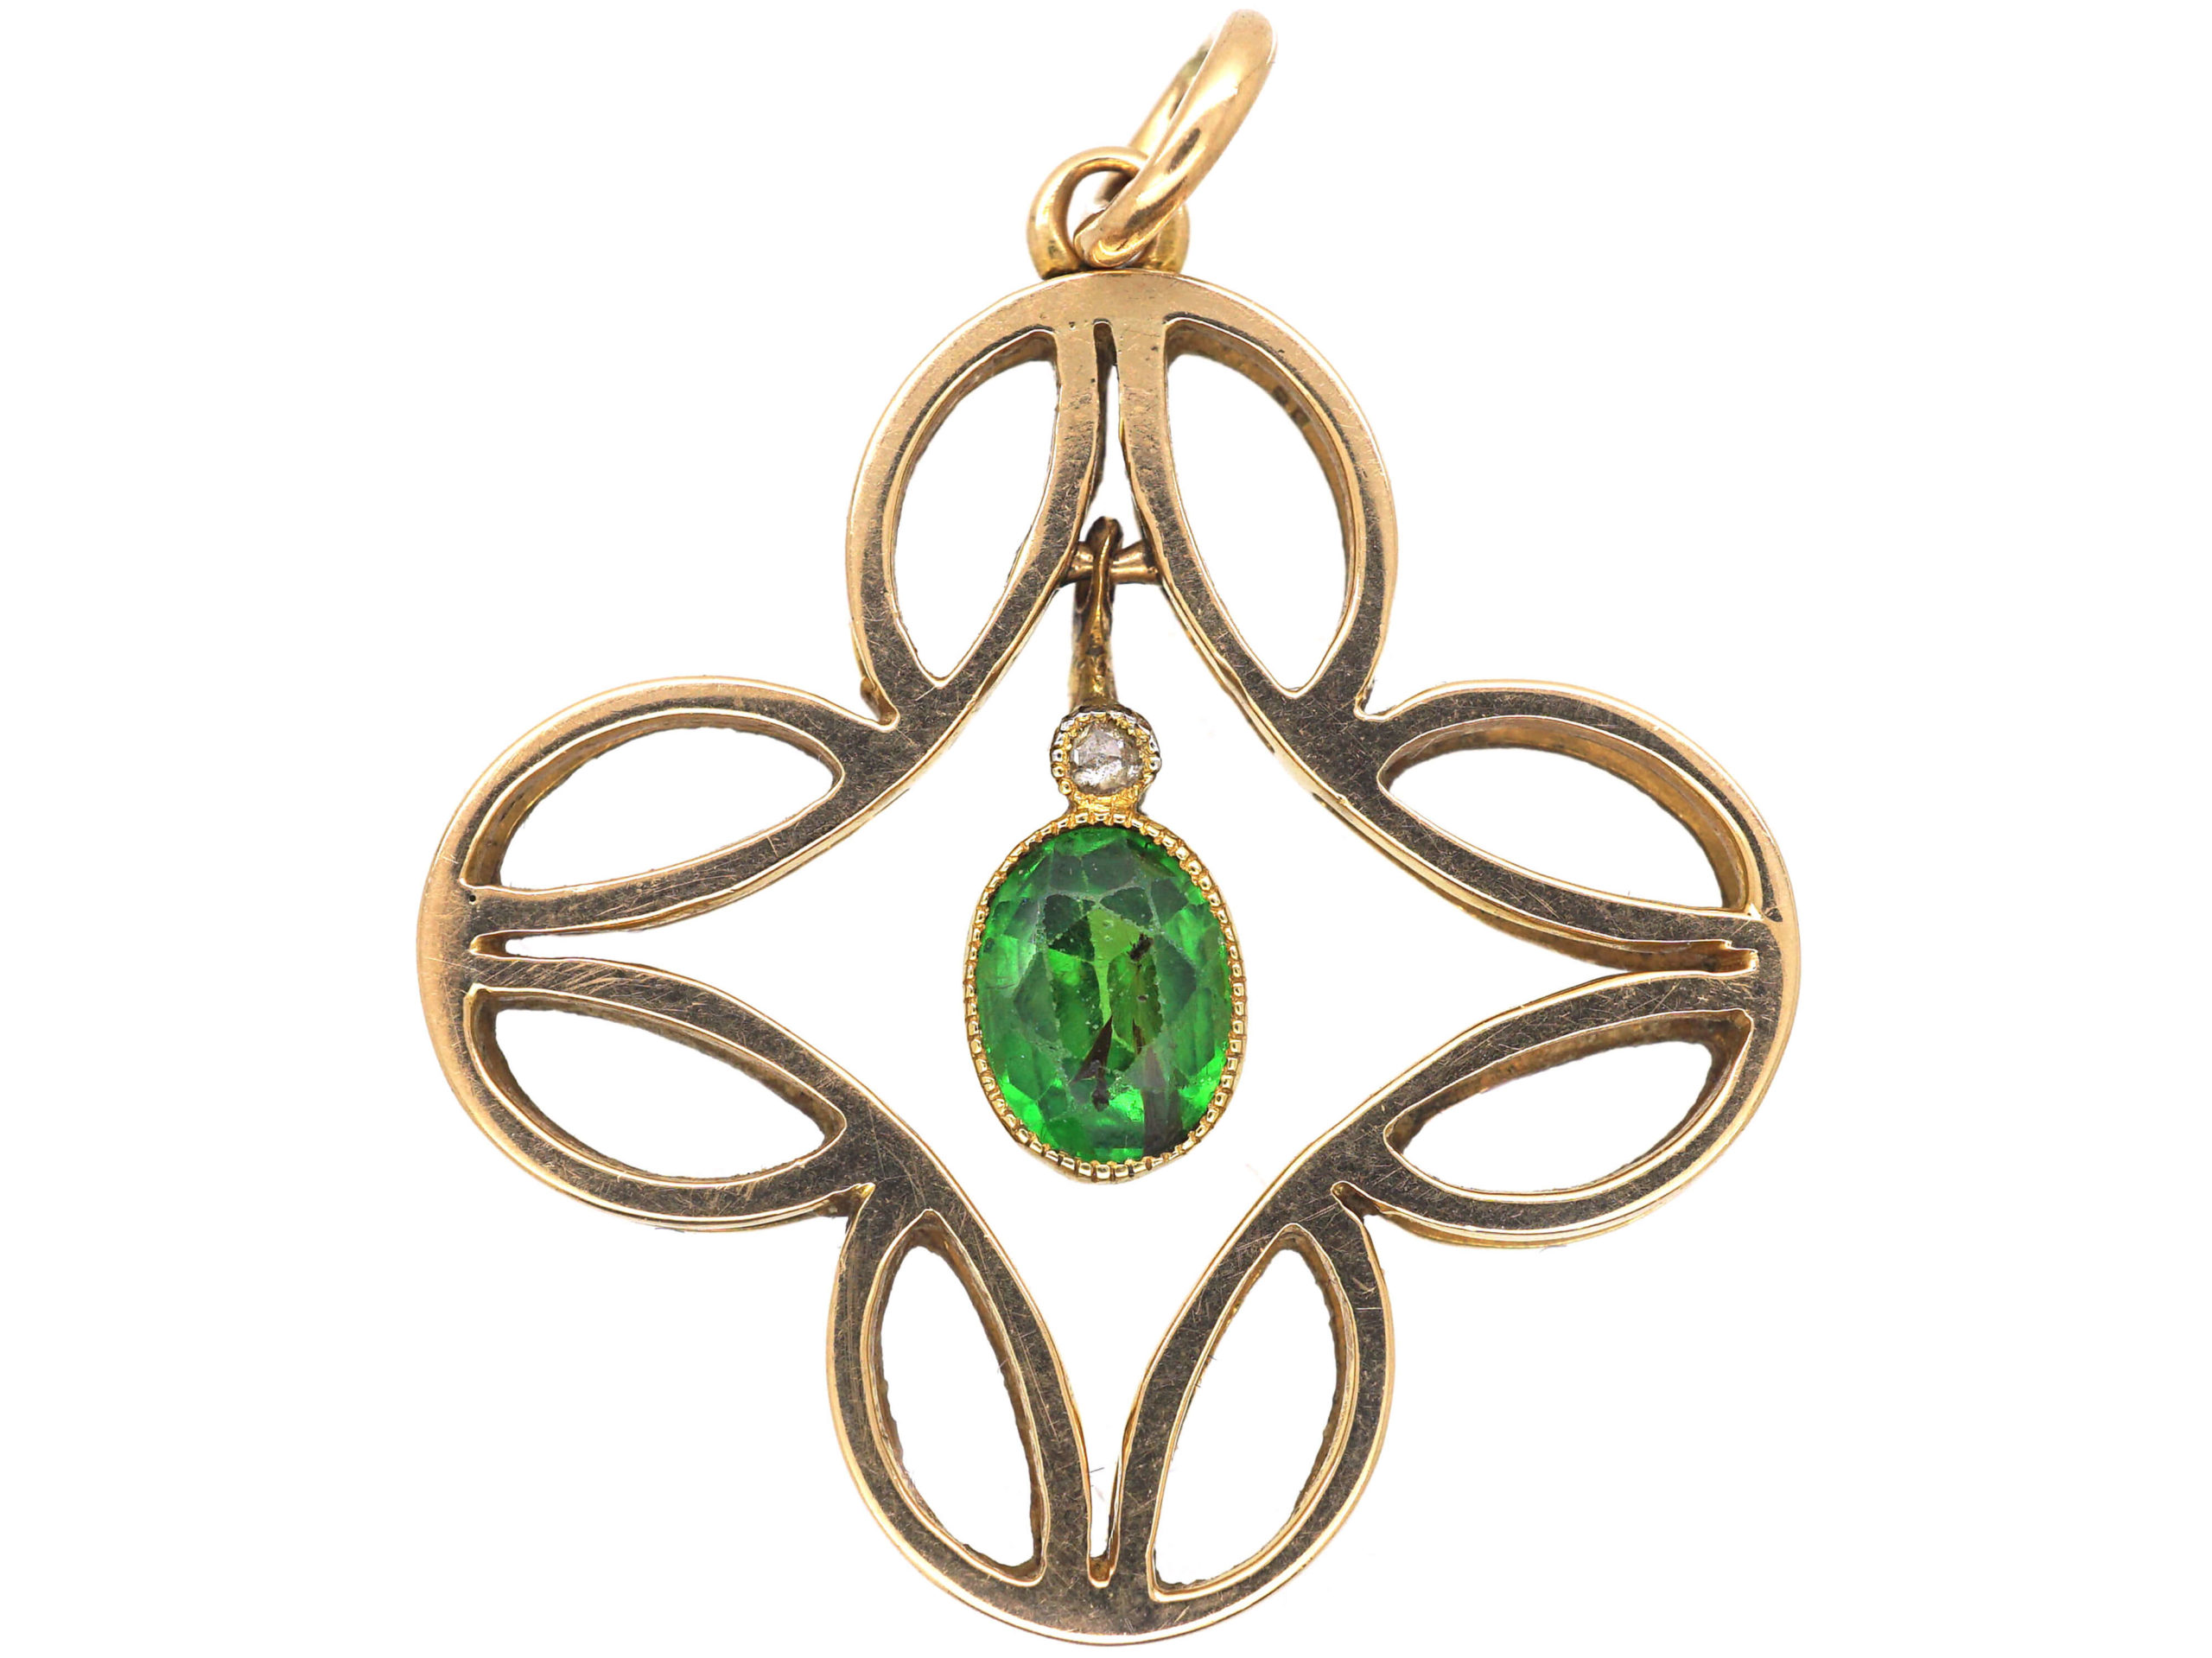 Edwardian 15ct Gold, Diamond & Green Garnet Pendant